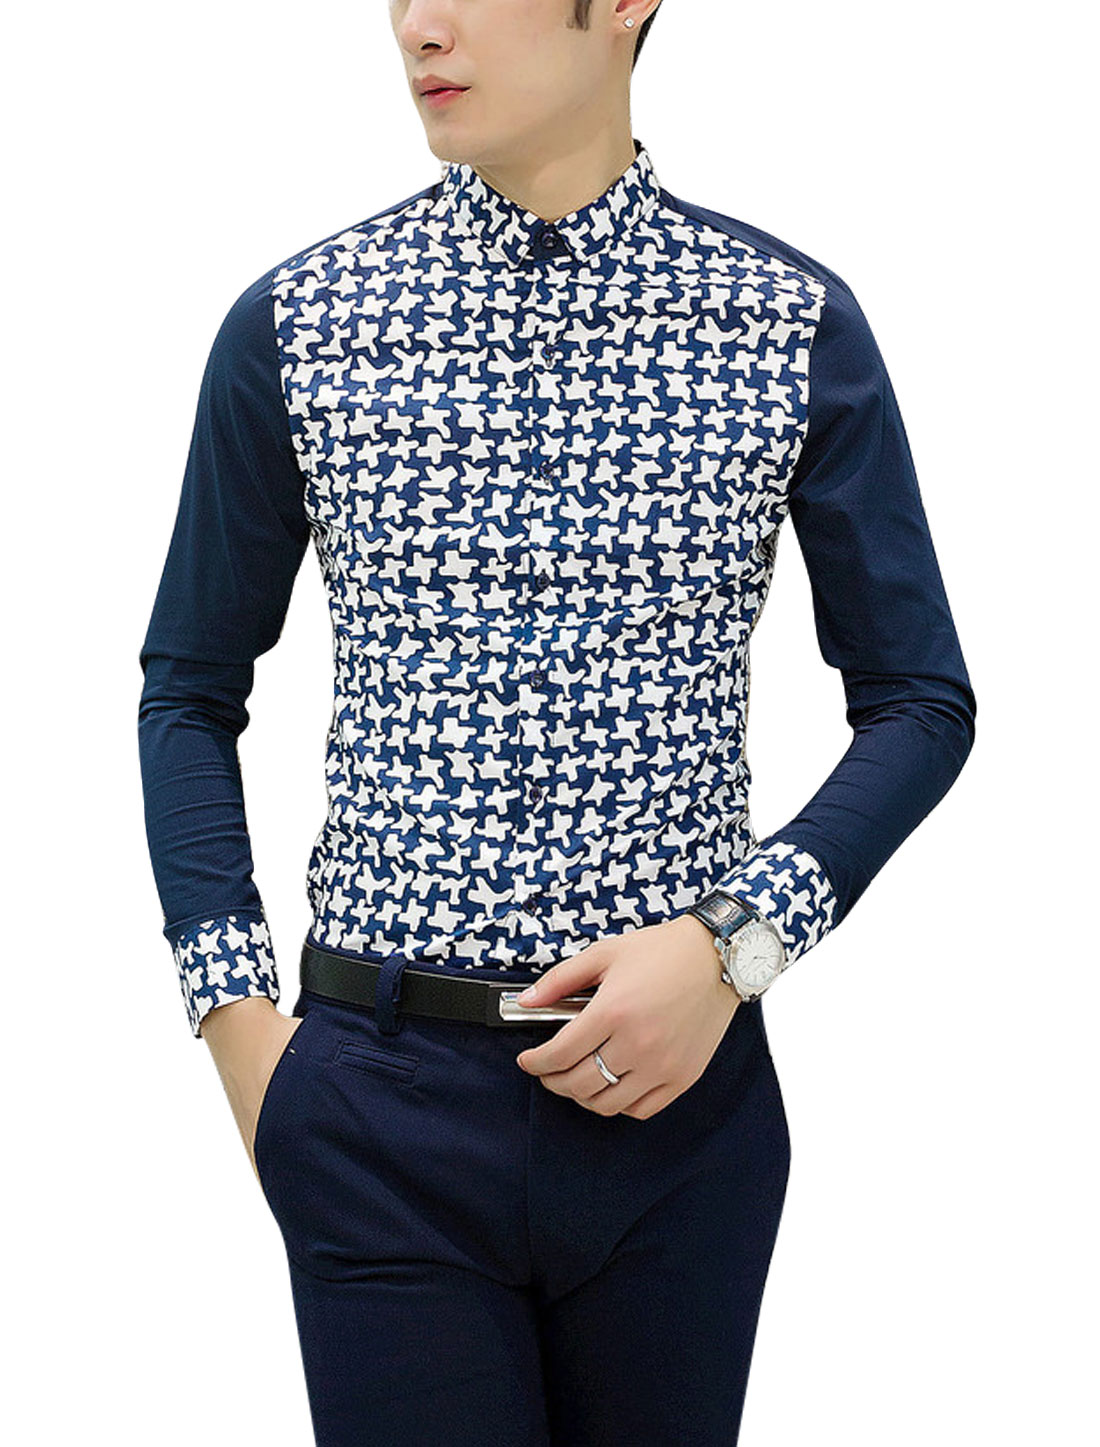 Men Contrast Novelty Print Panel Point Collar Stylish Shirt Navy Blue White M